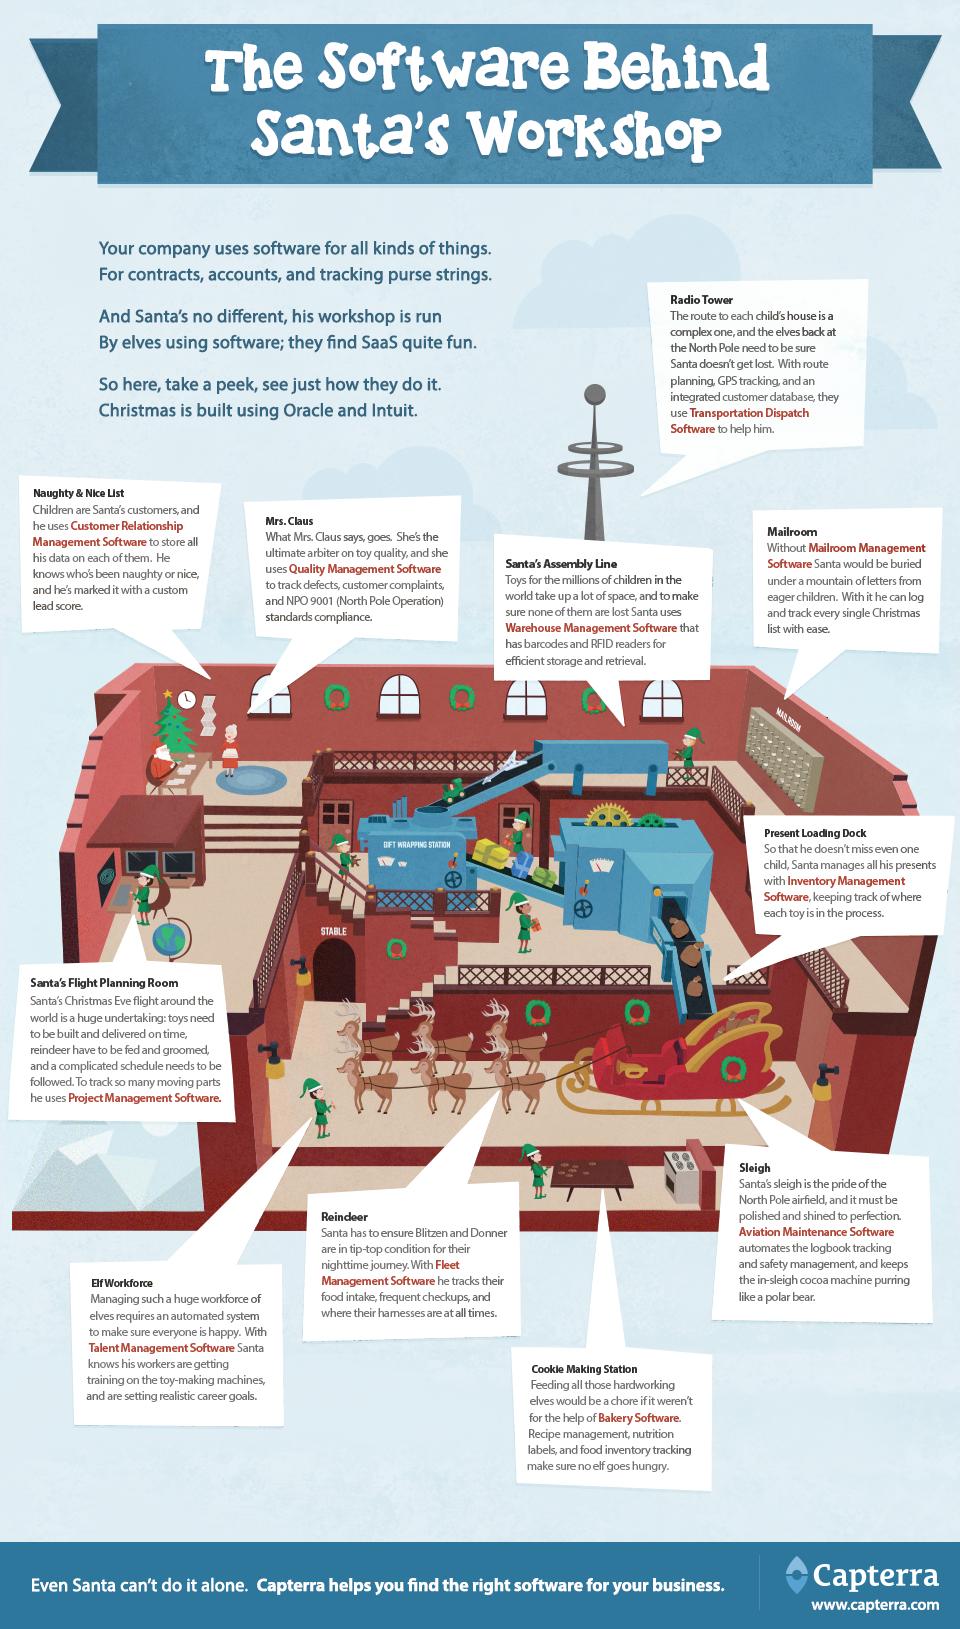 Software-behind-santas-workshop-infographic